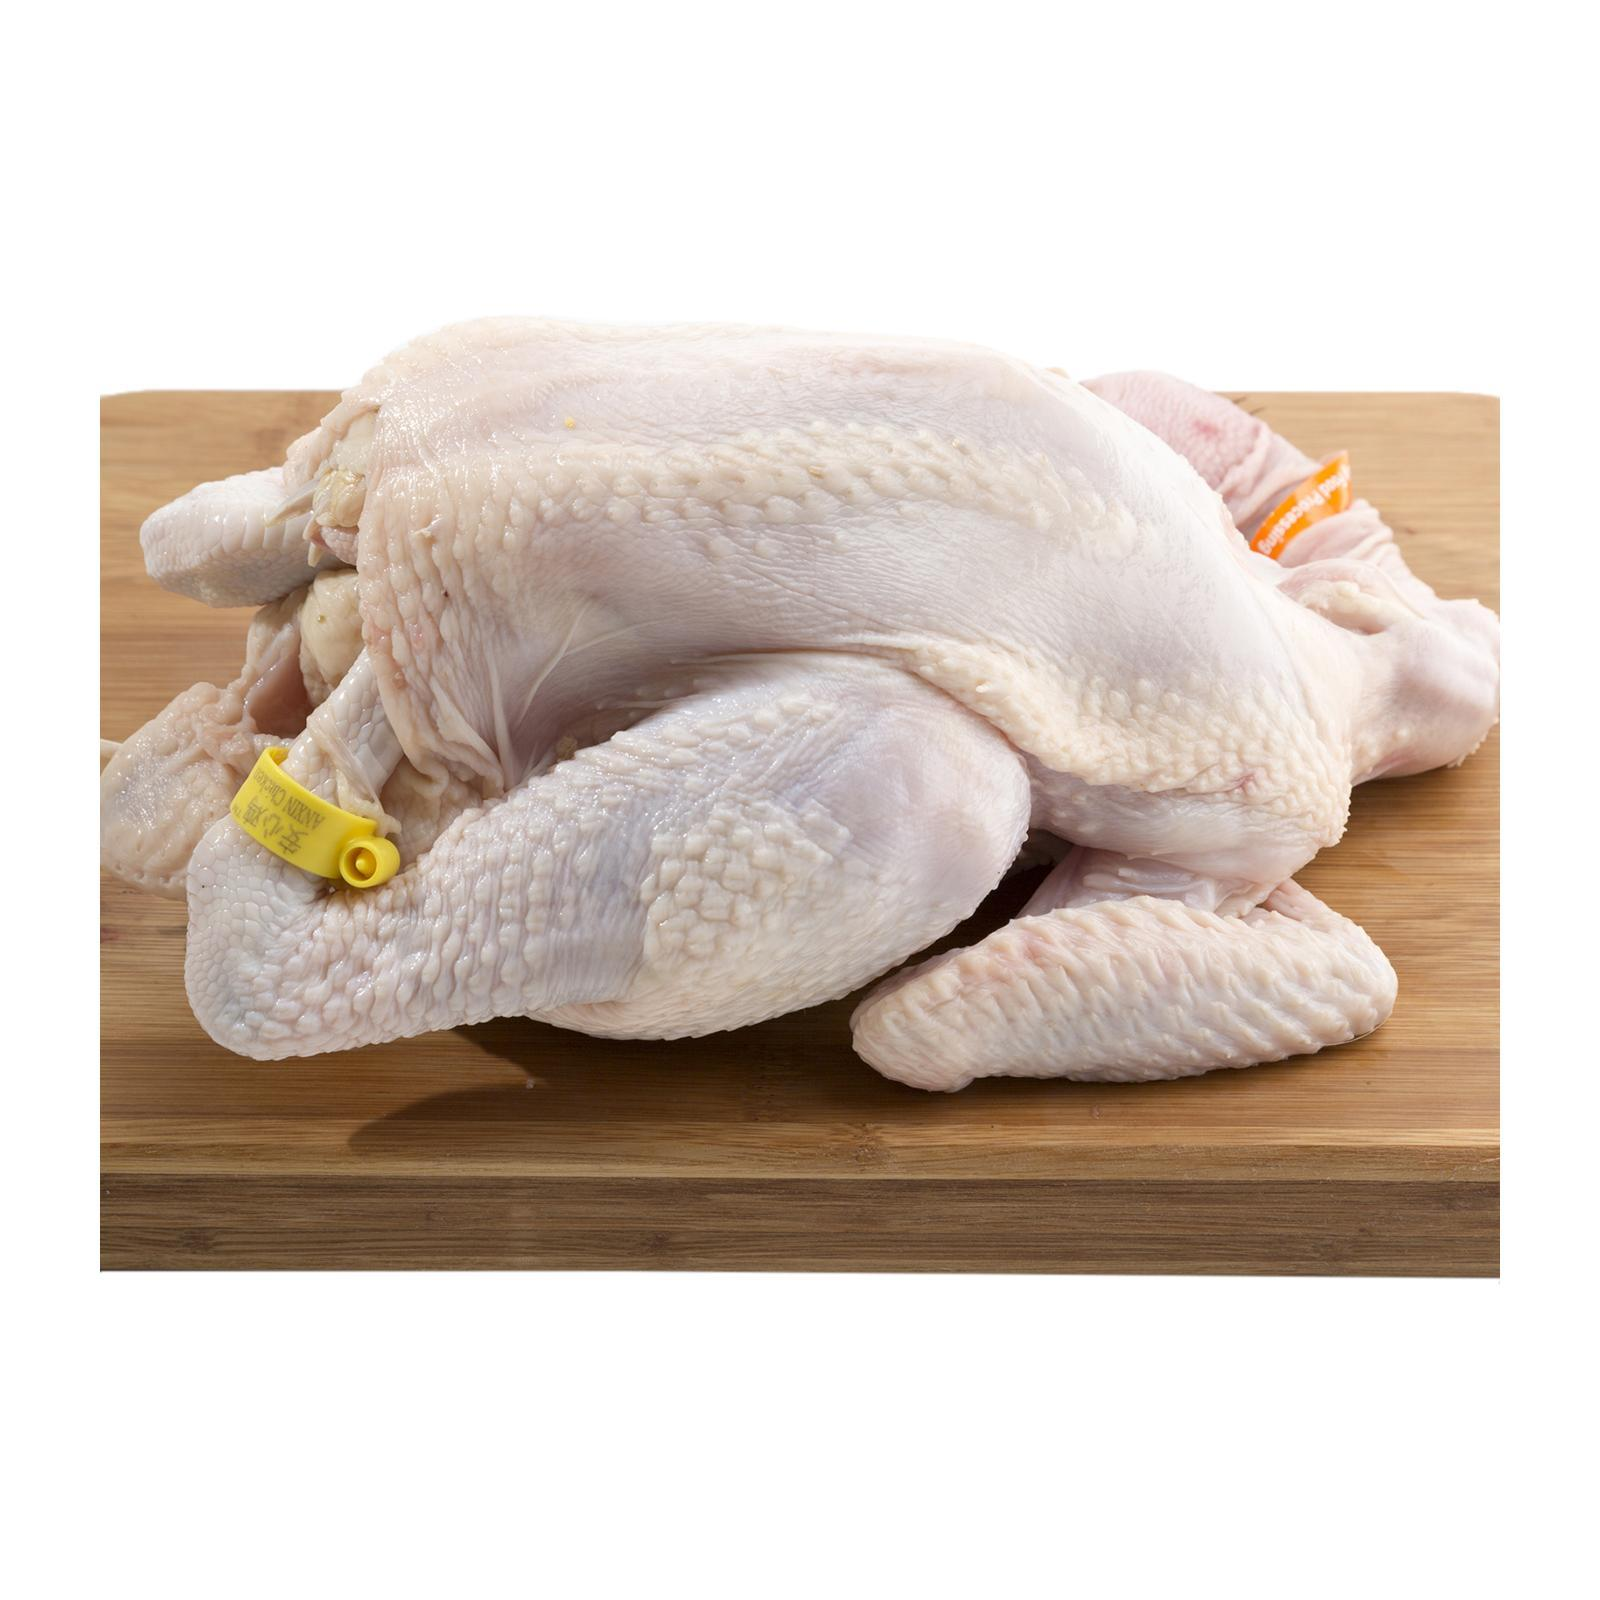 AW'S Market Fresh Anxin Kampong Chicken (M)